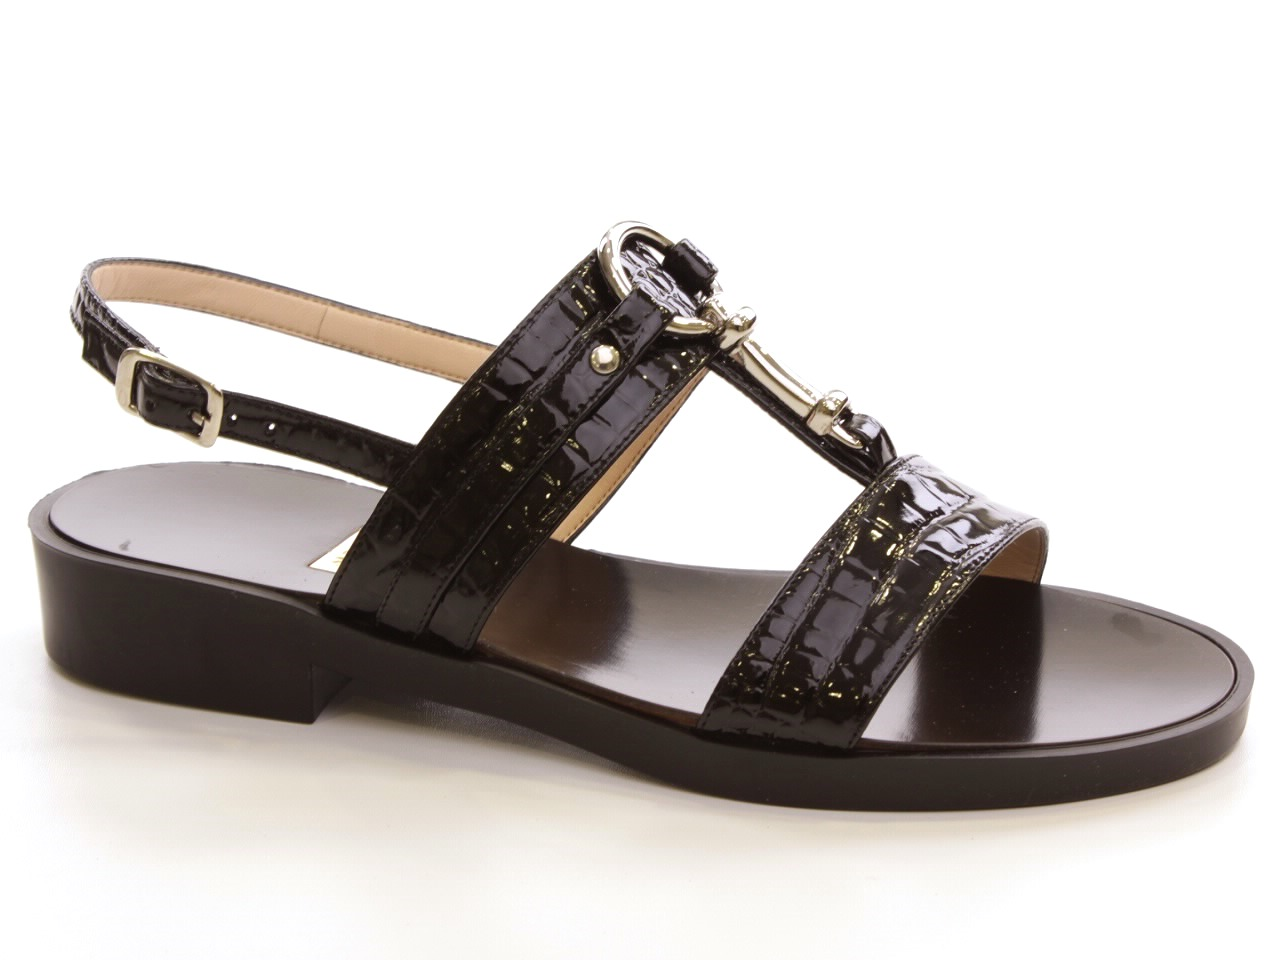 Sandales Plates Albano - 627 42251